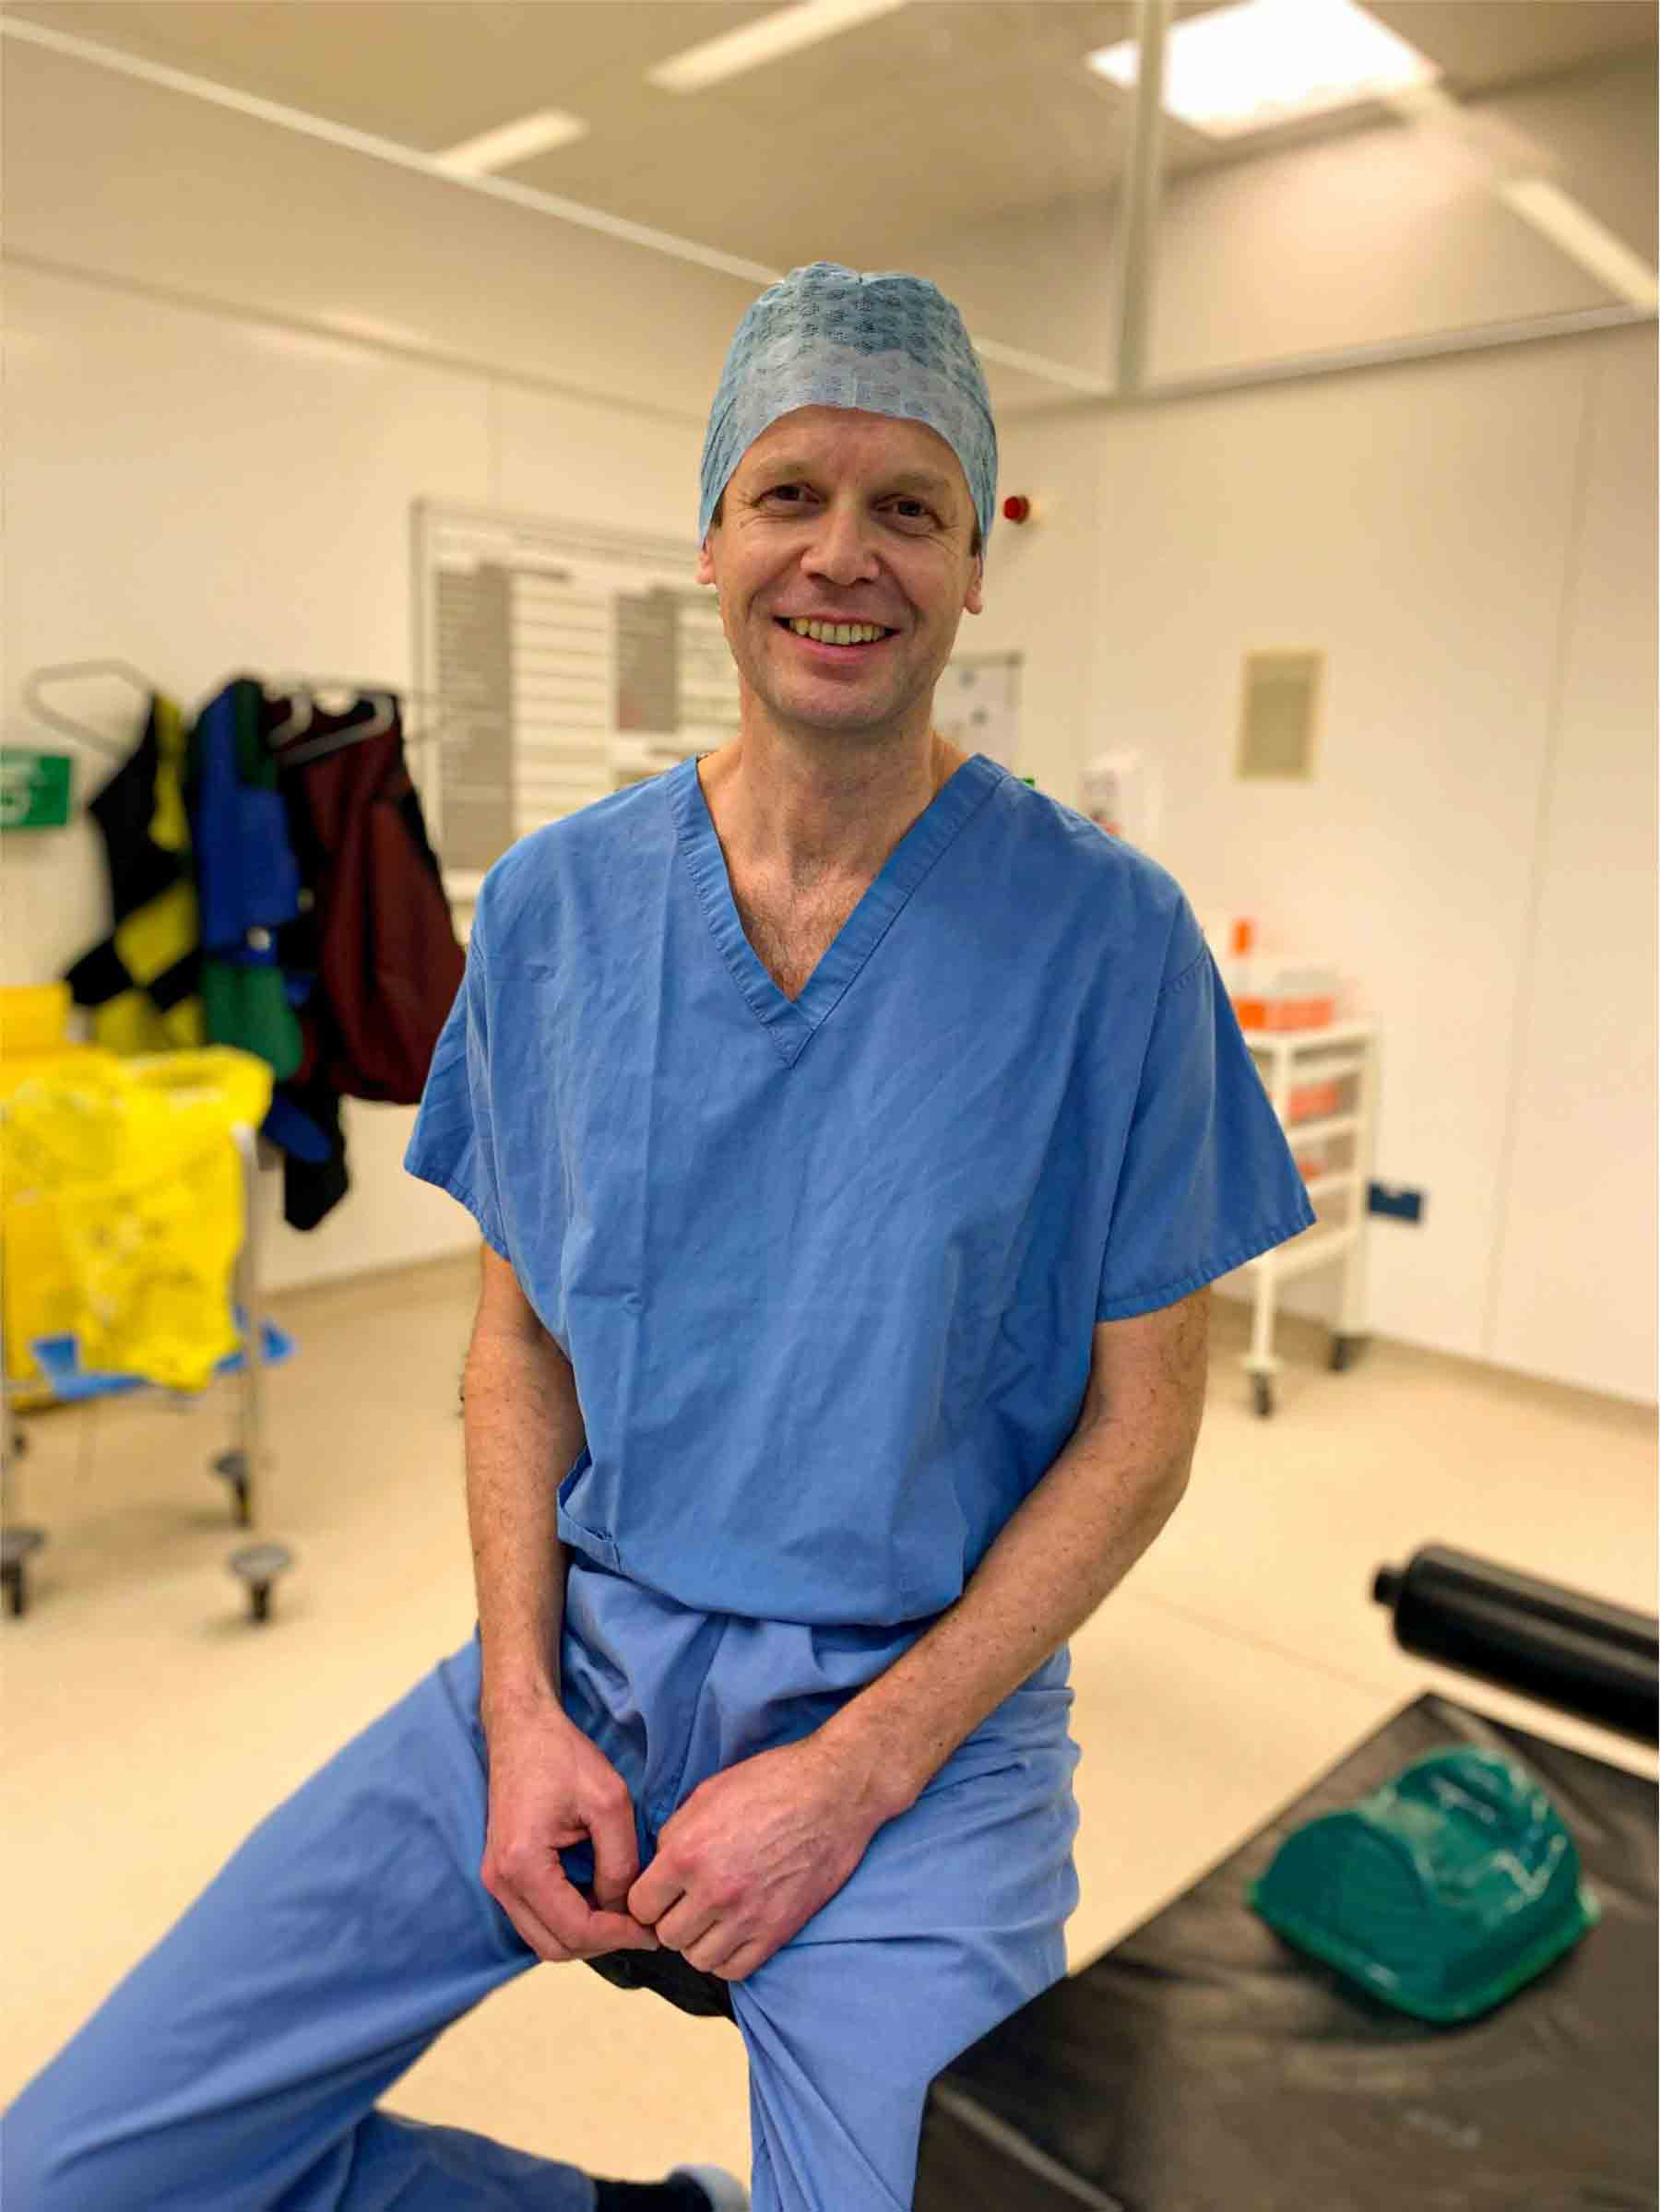 Dr Matija Krkovic, the best limb reconstructive surgeon in UK, sitting in theatre in blue scrubs